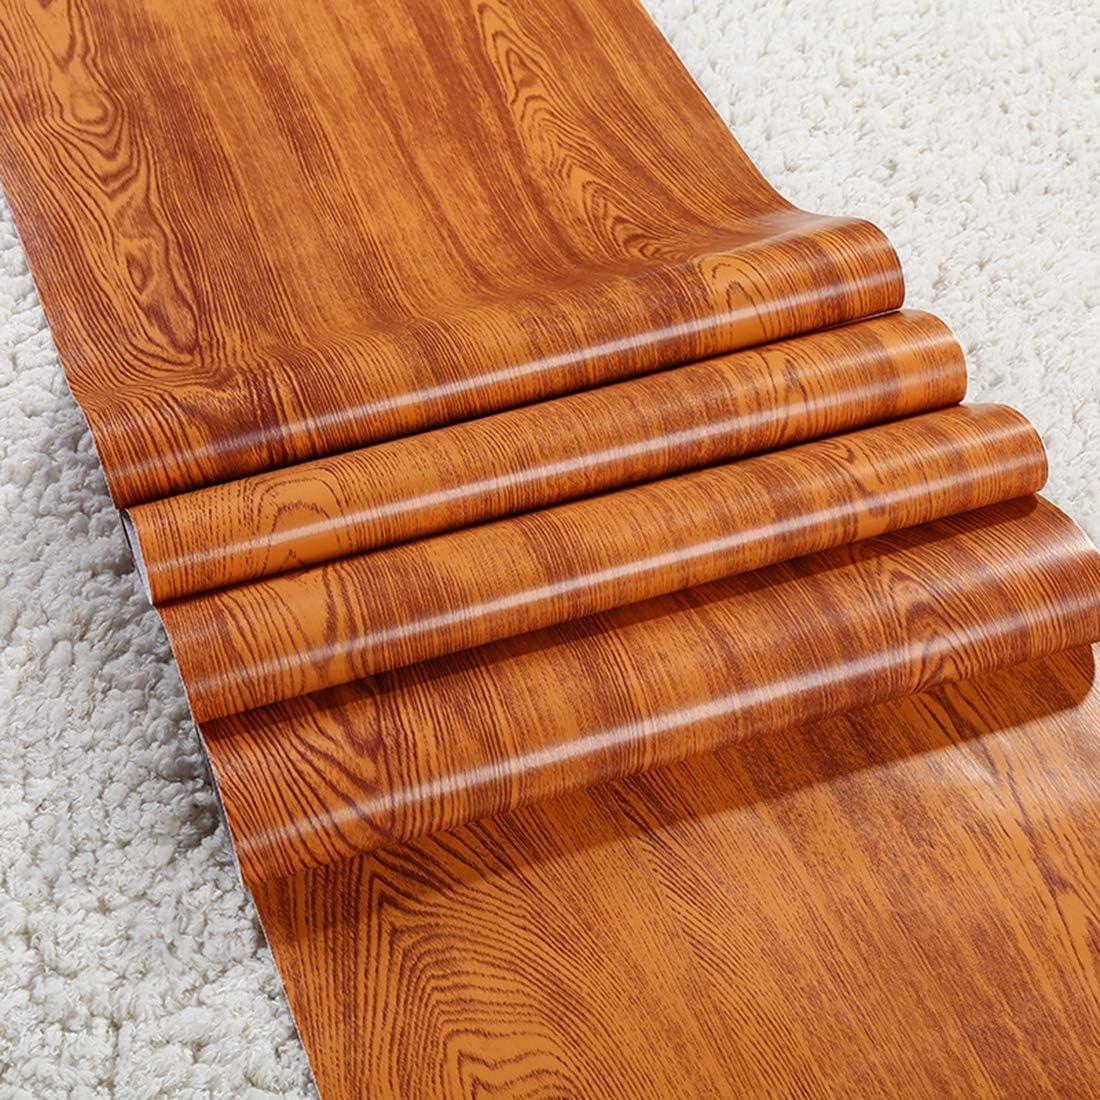 GLOW4U Faux Oak Wood Grain Contact Paper for Cabinets Countertops Decorative Self Adhesive Vinyl Film Laminate Shelf Drawer Liner 17.7x117 Inches